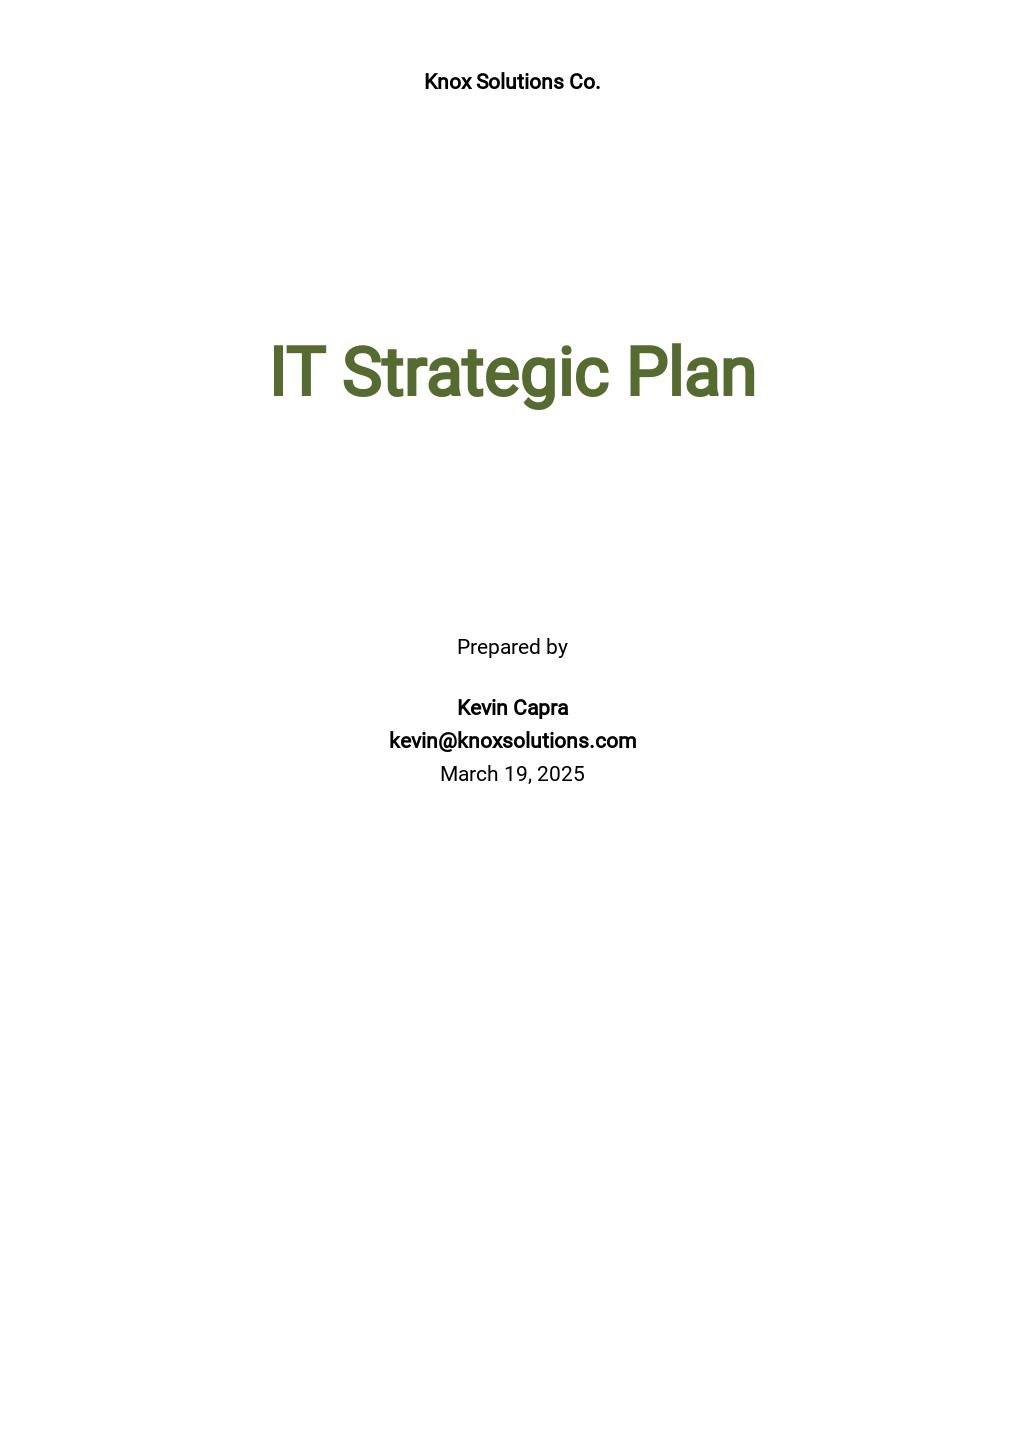 IT Strategic Plan Template